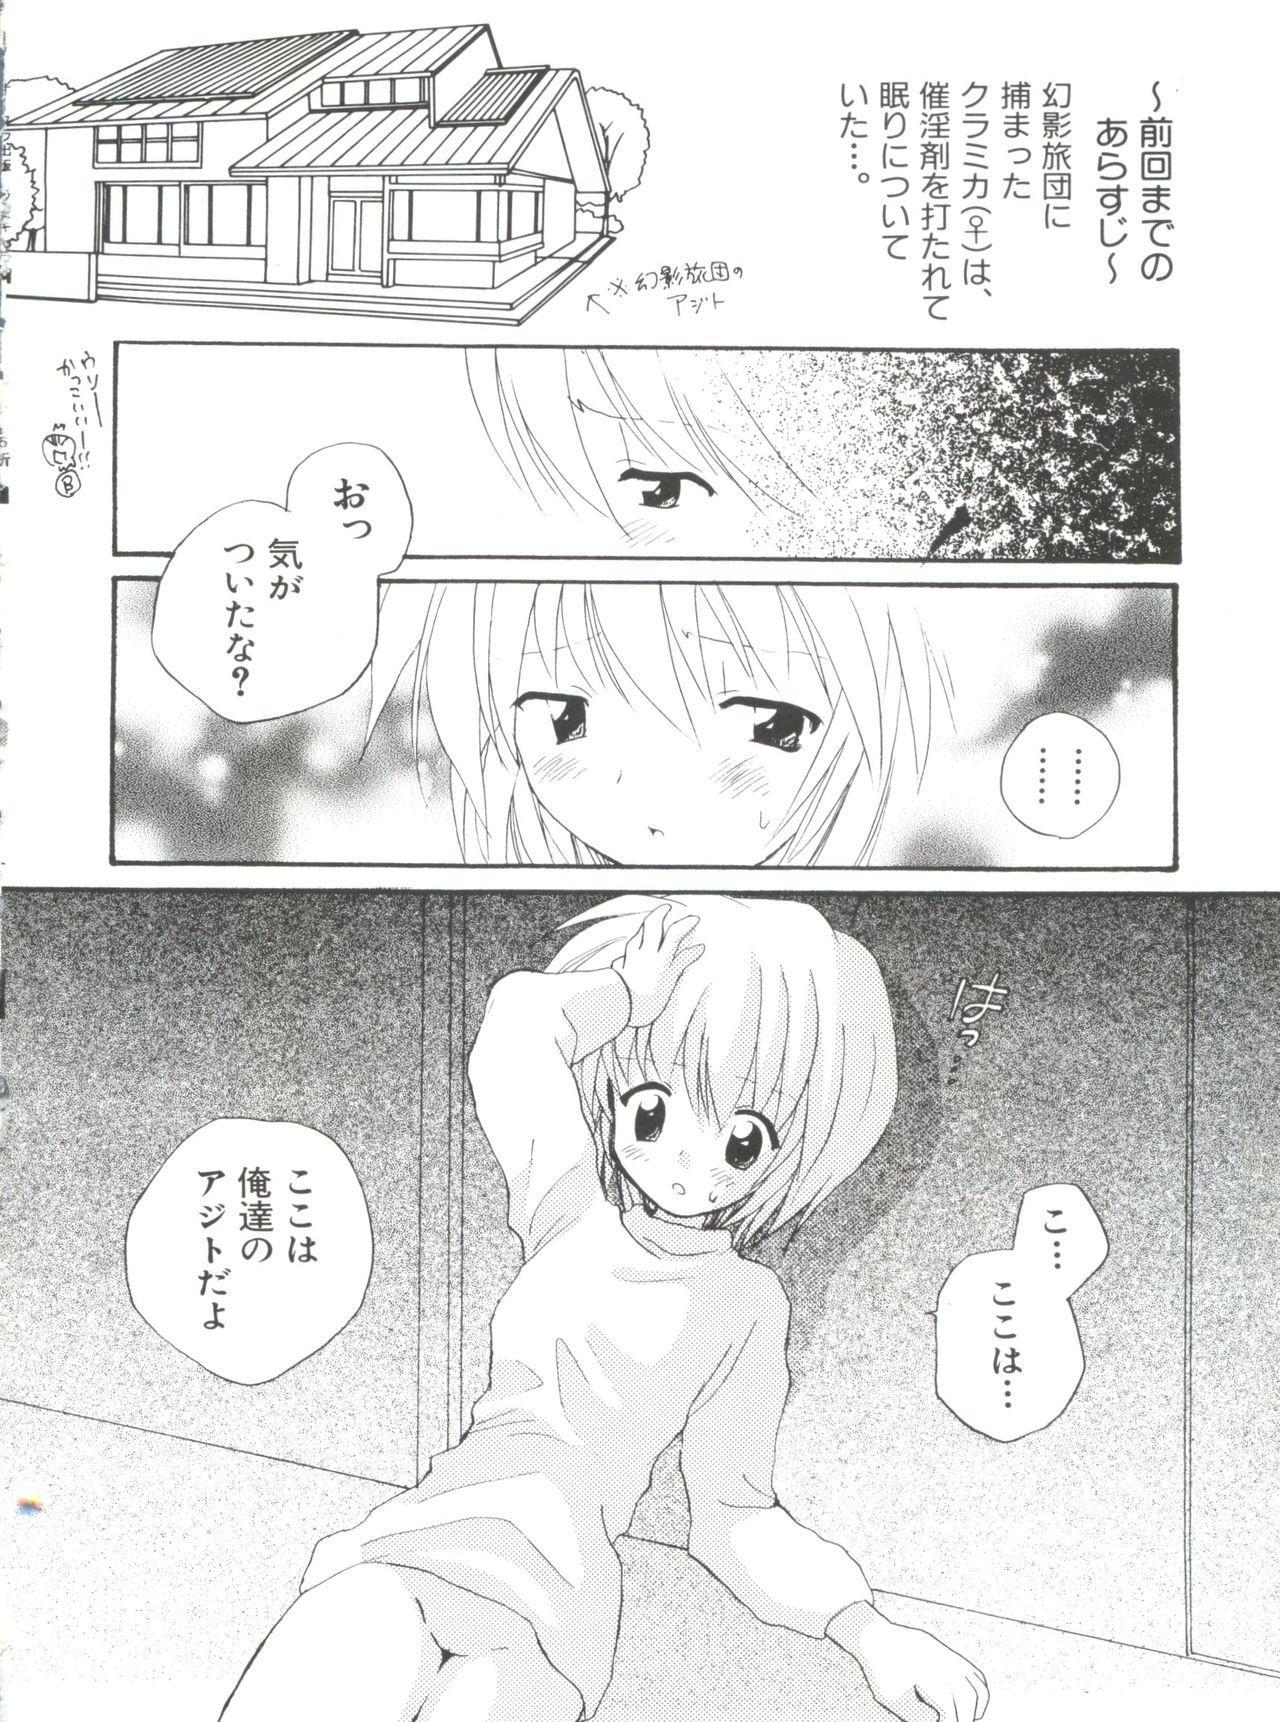 Love Chara Taizen No. 9 98